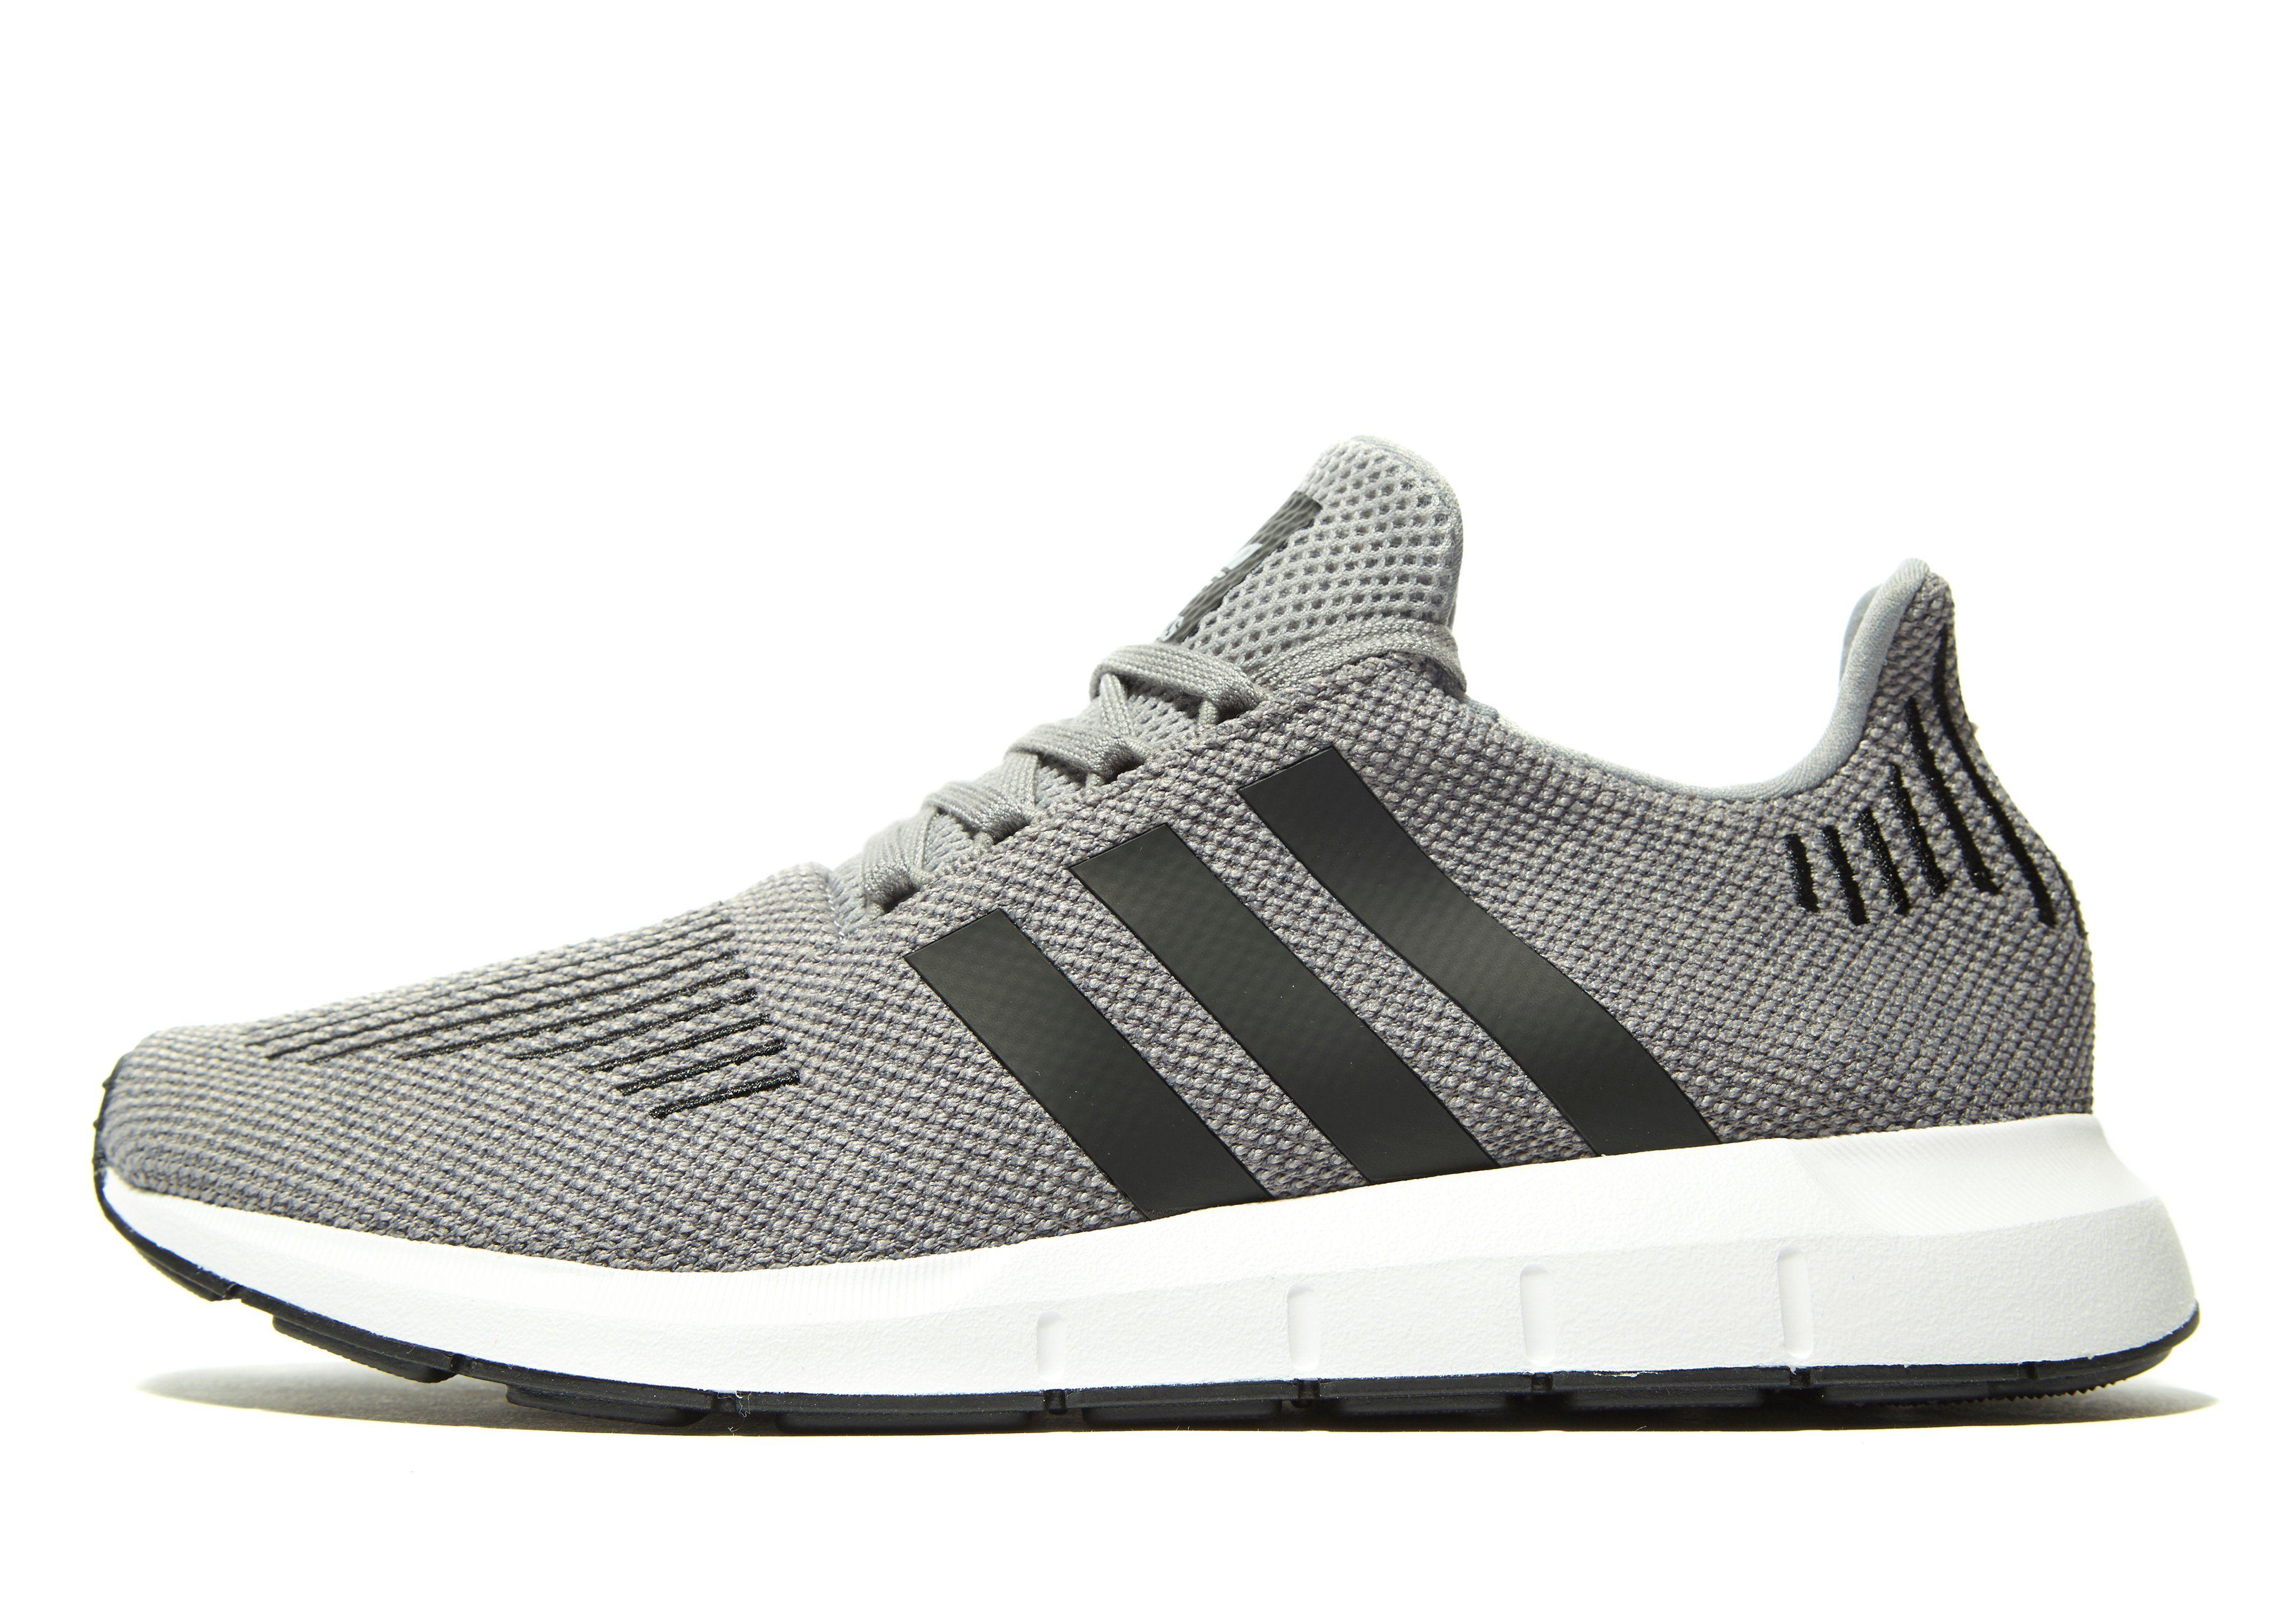 Adidas Nmd Women Fashion Trending Running Sports Shoes Uk